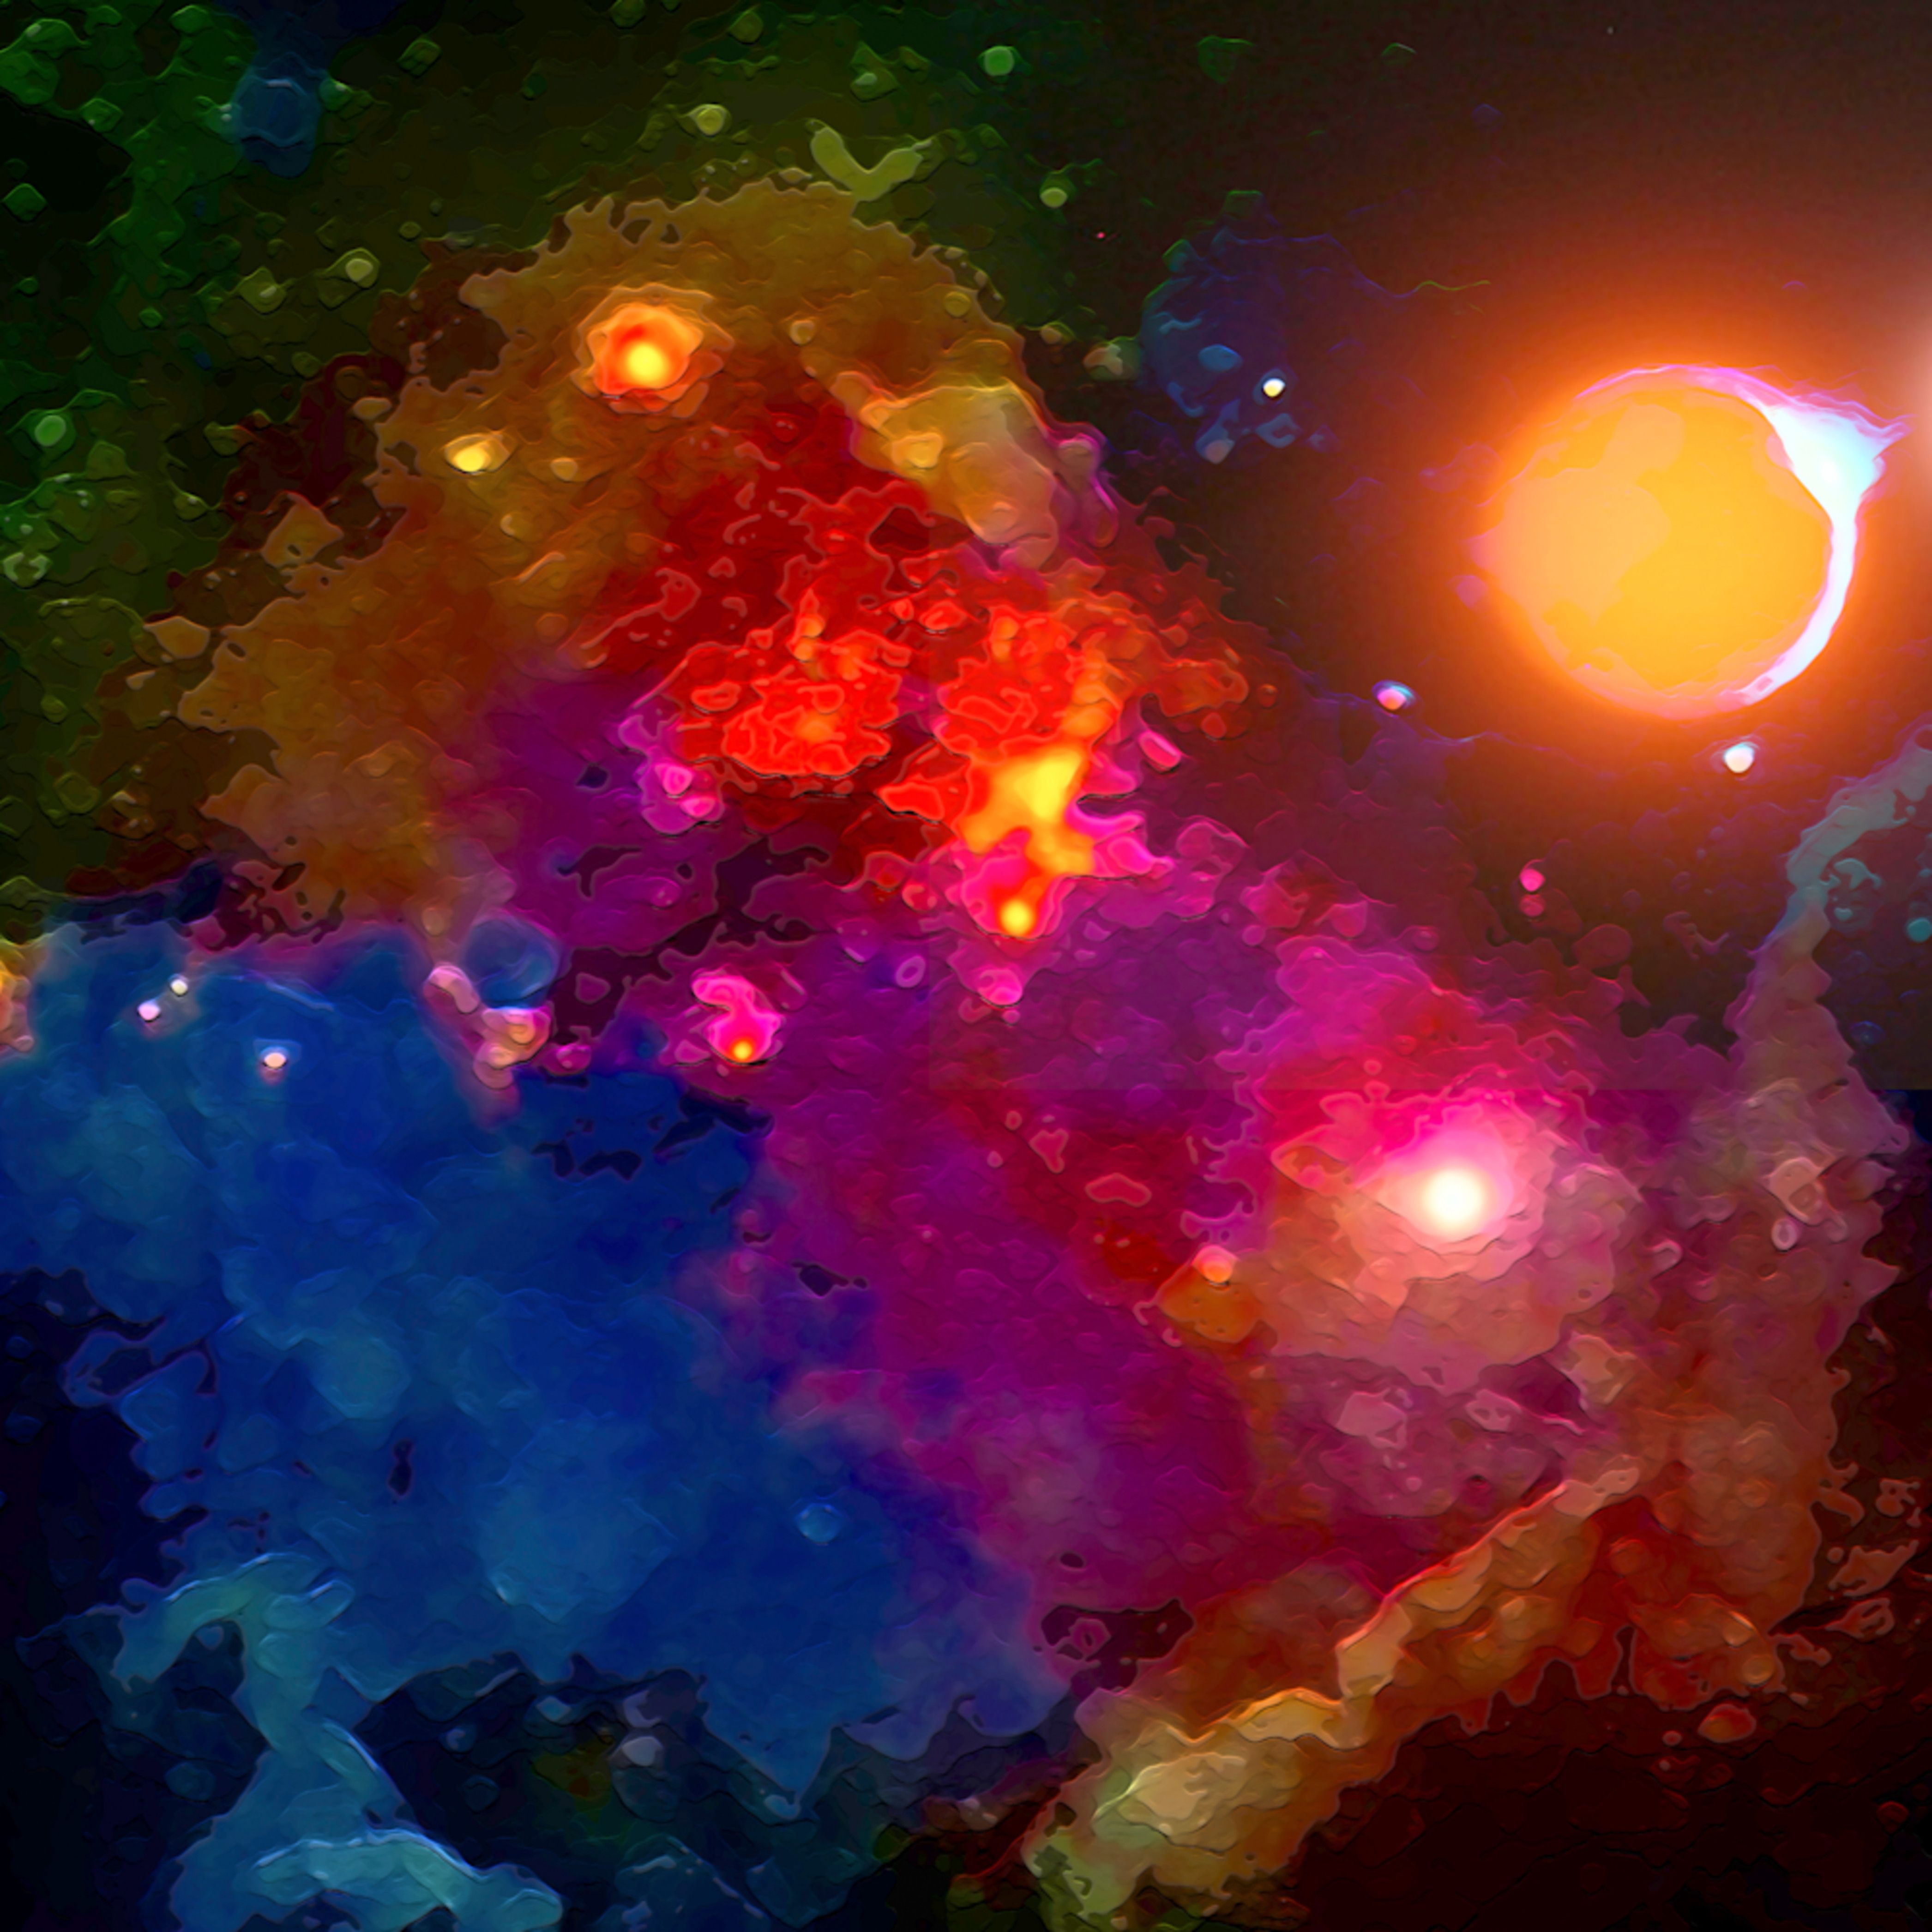 Abstract space q3fsub